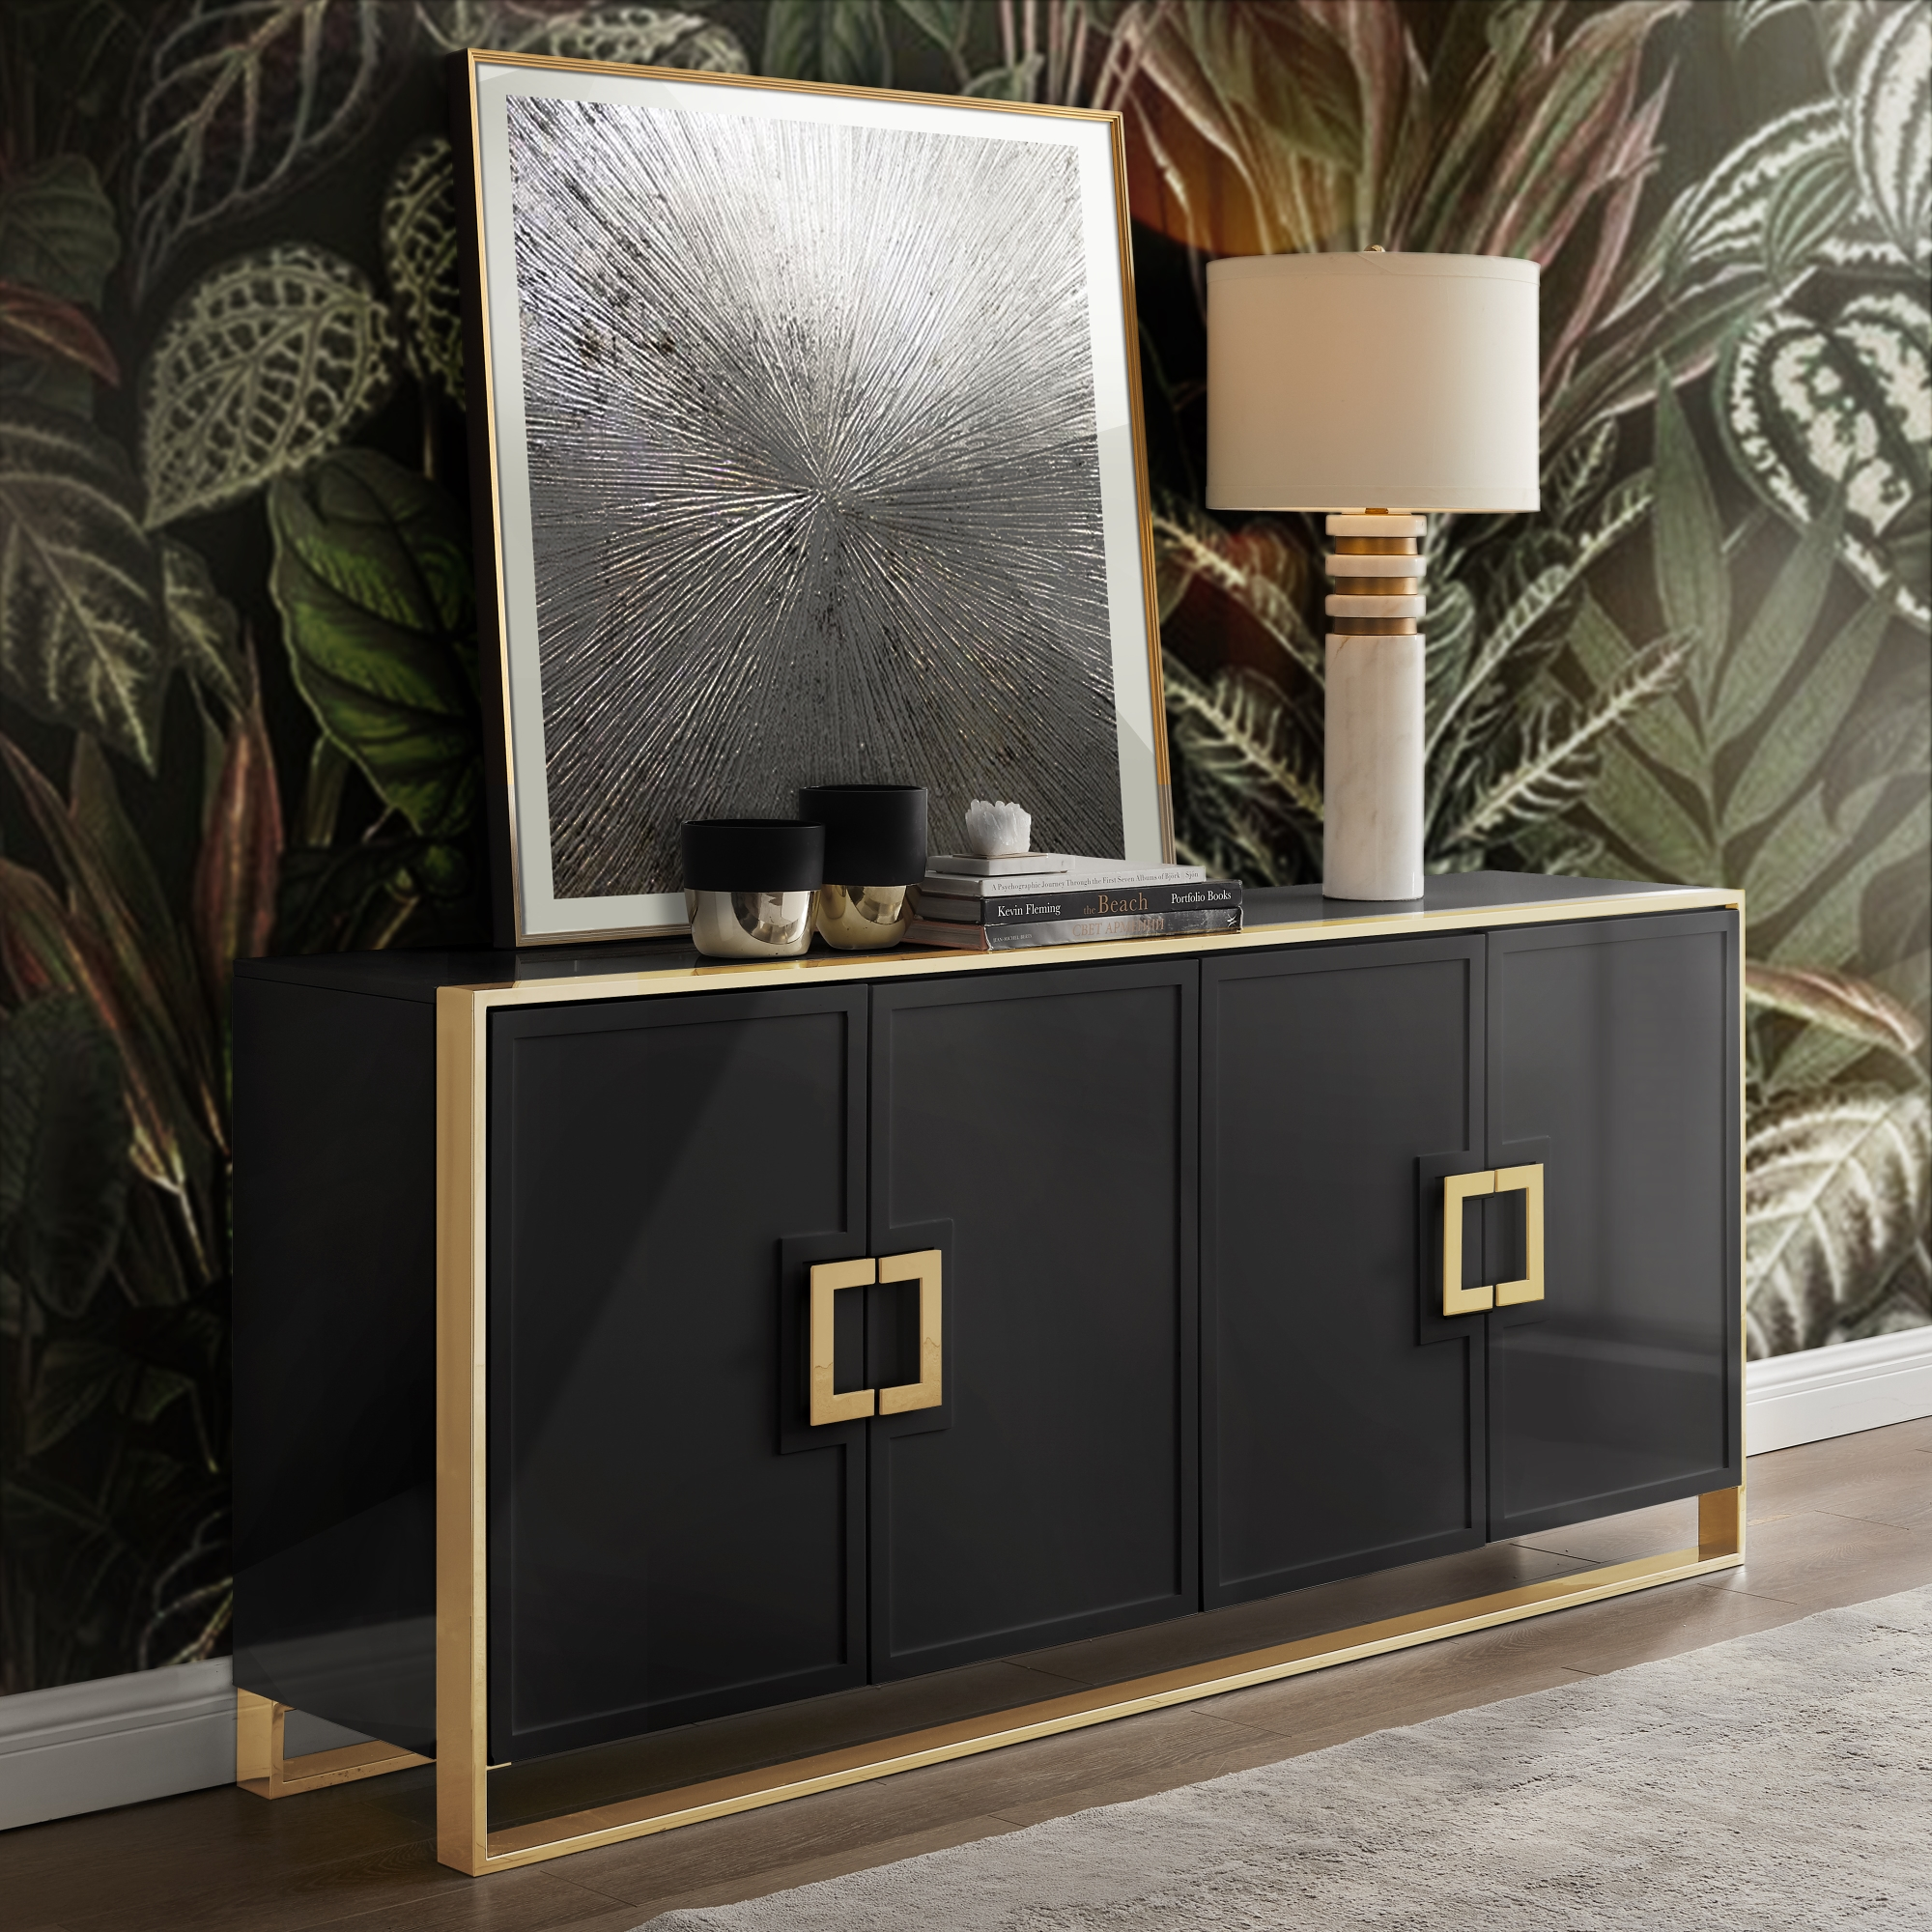 Inspired Home Moani Sideboard Buffet 4 Doors Polished Gold Handle And Leg Tip 2 Adjustable Shelves Black Walmart Com Walmart Com